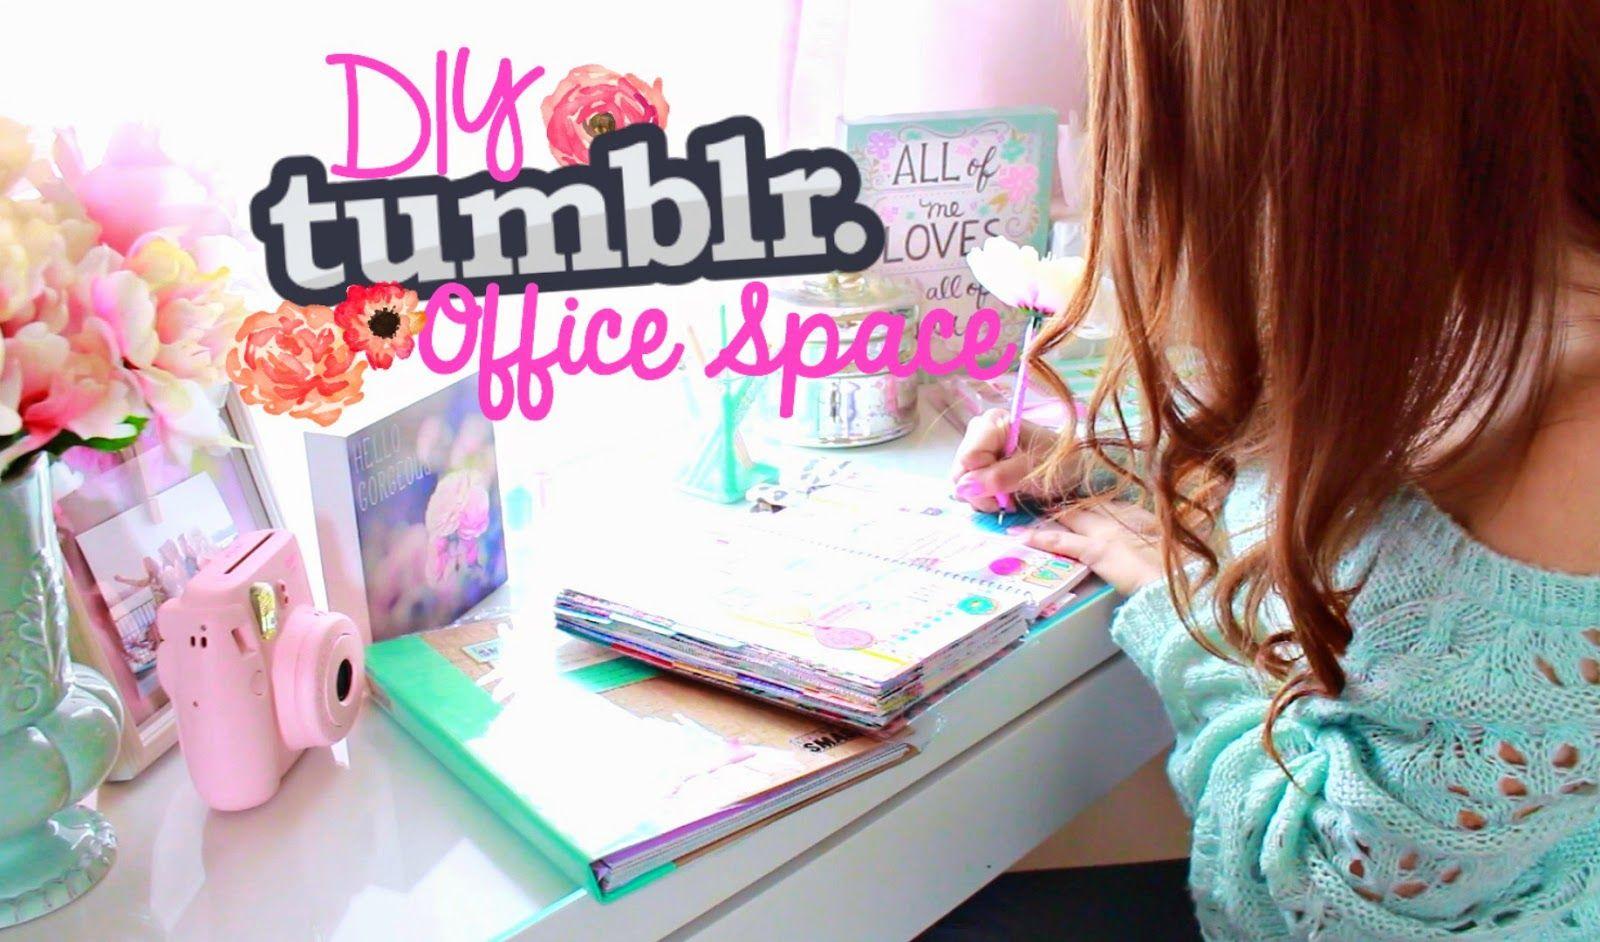 Tumblr room inspiration diy - Diy Tumblr Inspired Office Desk Space